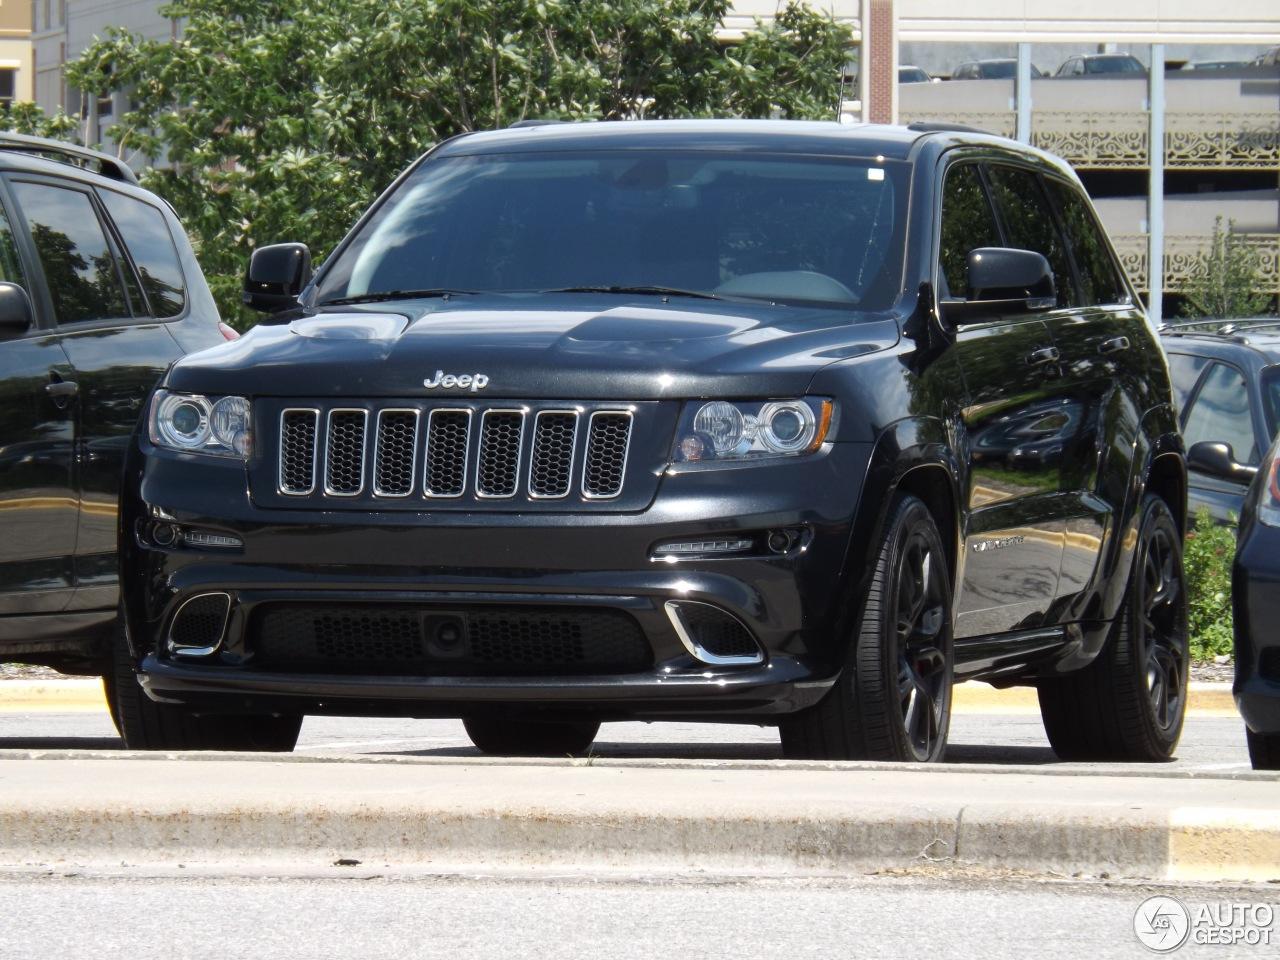 jeep grand cherokee srt 8 2012 13 june 2013 autogespot. Black Bedroom Furniture Sets. Home Design Ideas